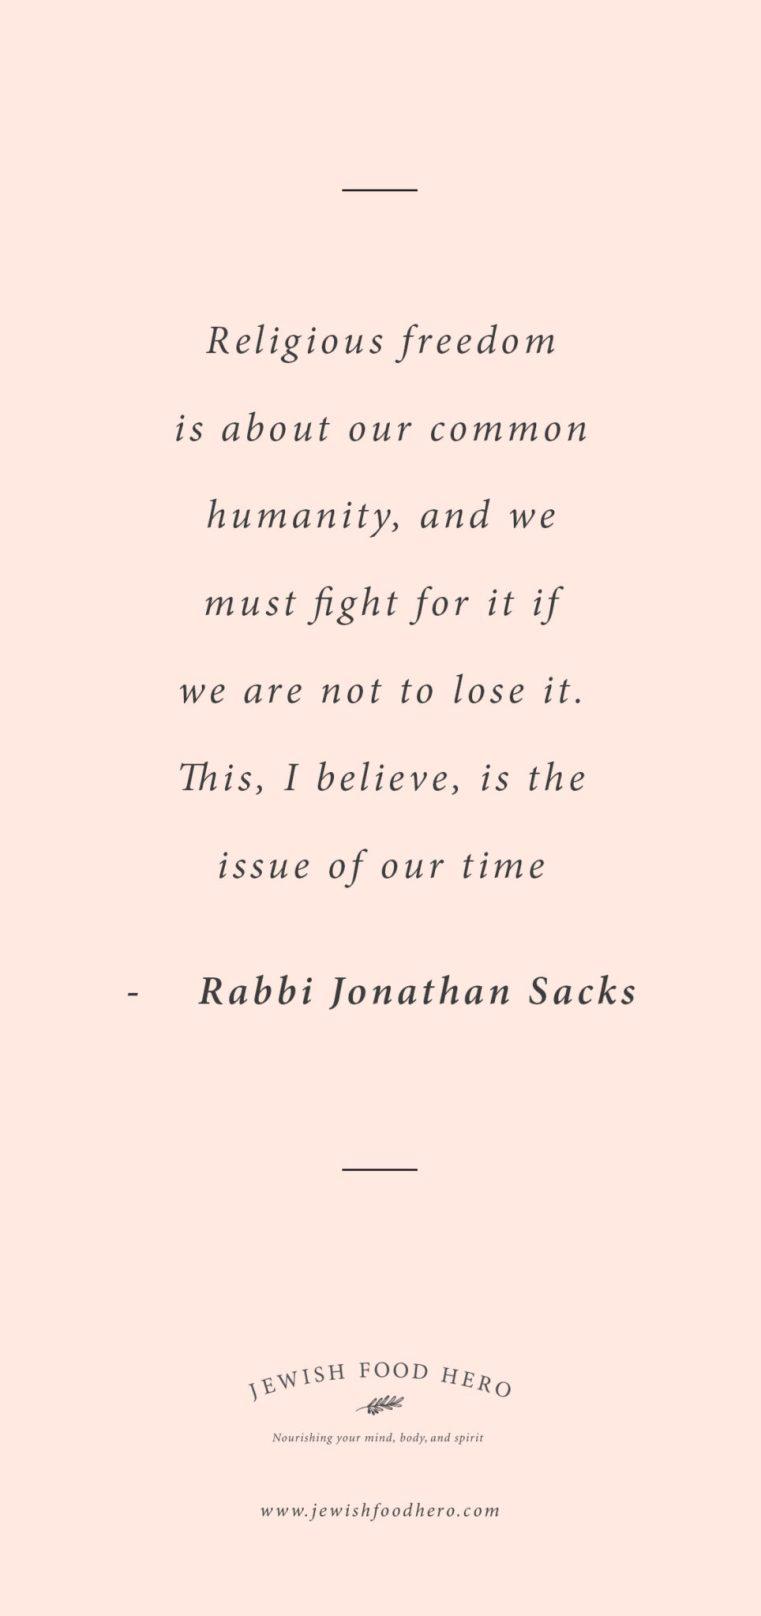 Rabbi Jonathan Sacks quotes, quotes on religious freedom, Jewish quotes on freedom